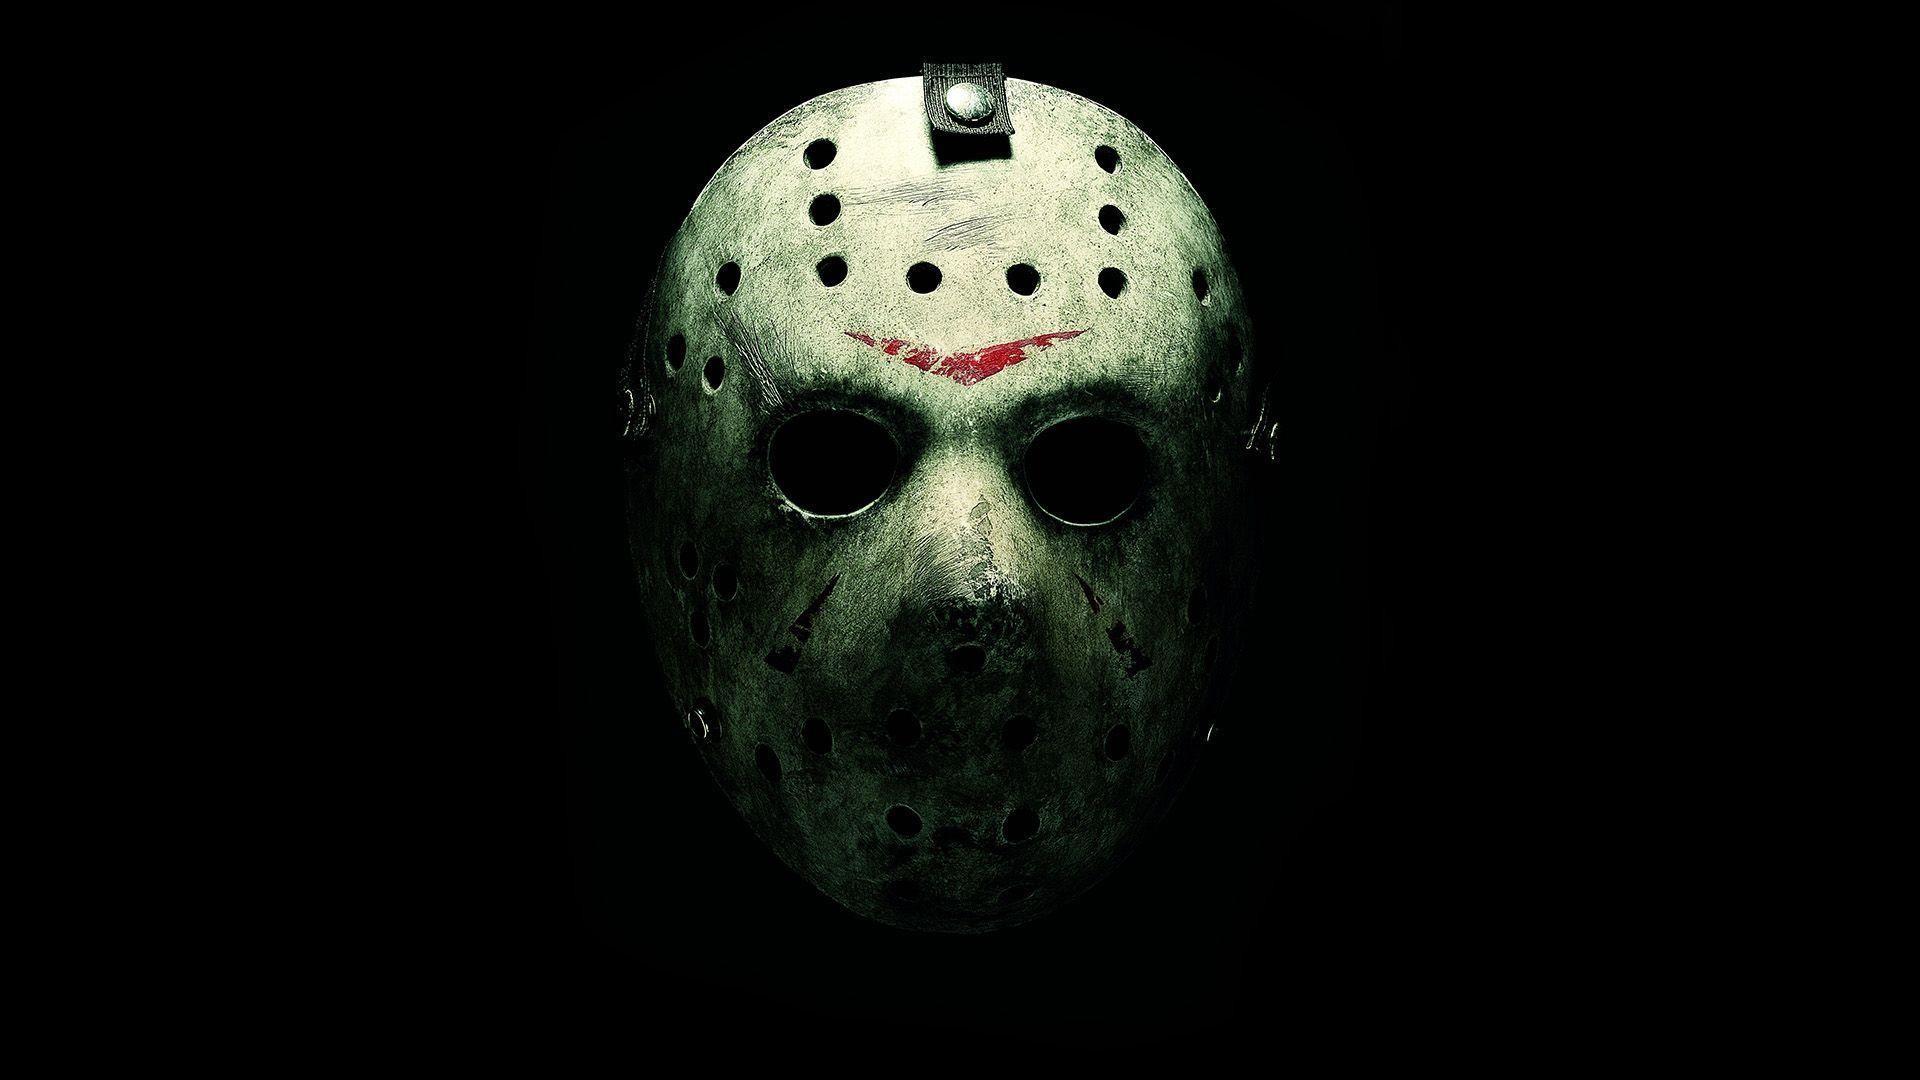 Jason Friday the 13th Wallpaper – WallpaperSafari